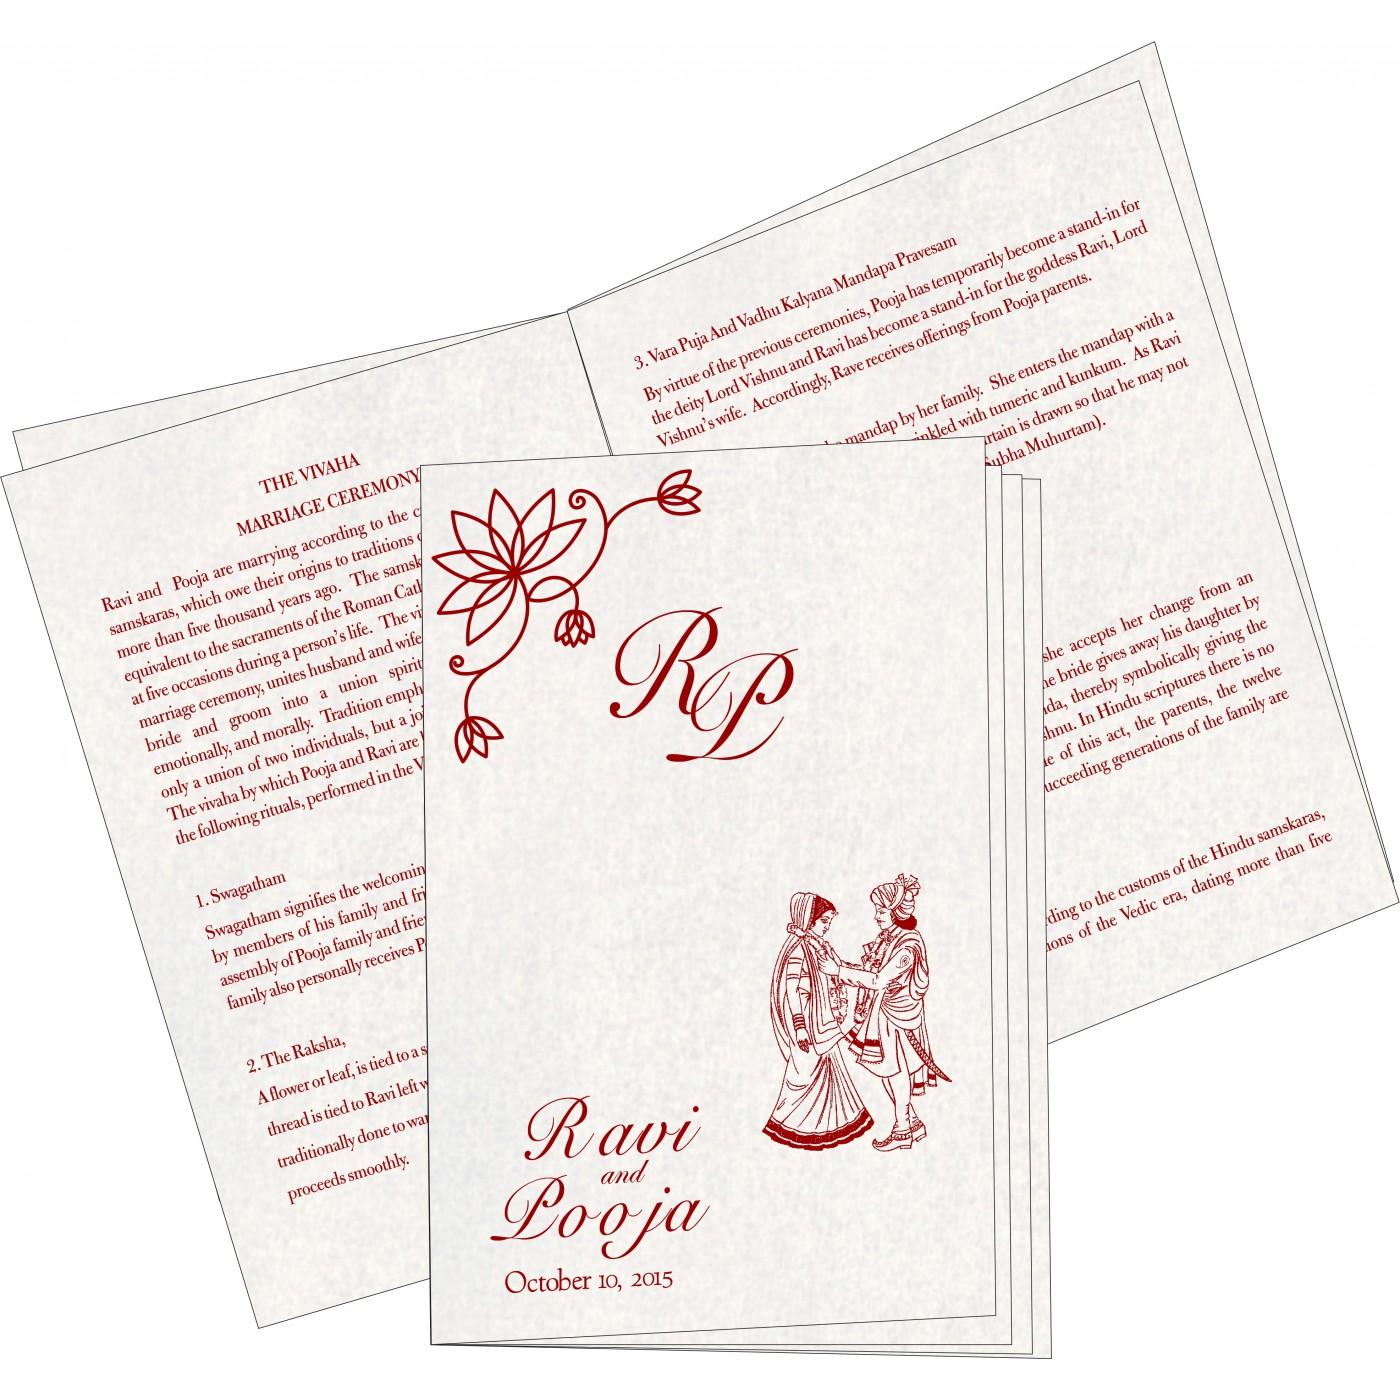 Program Booklet - PC-8251L